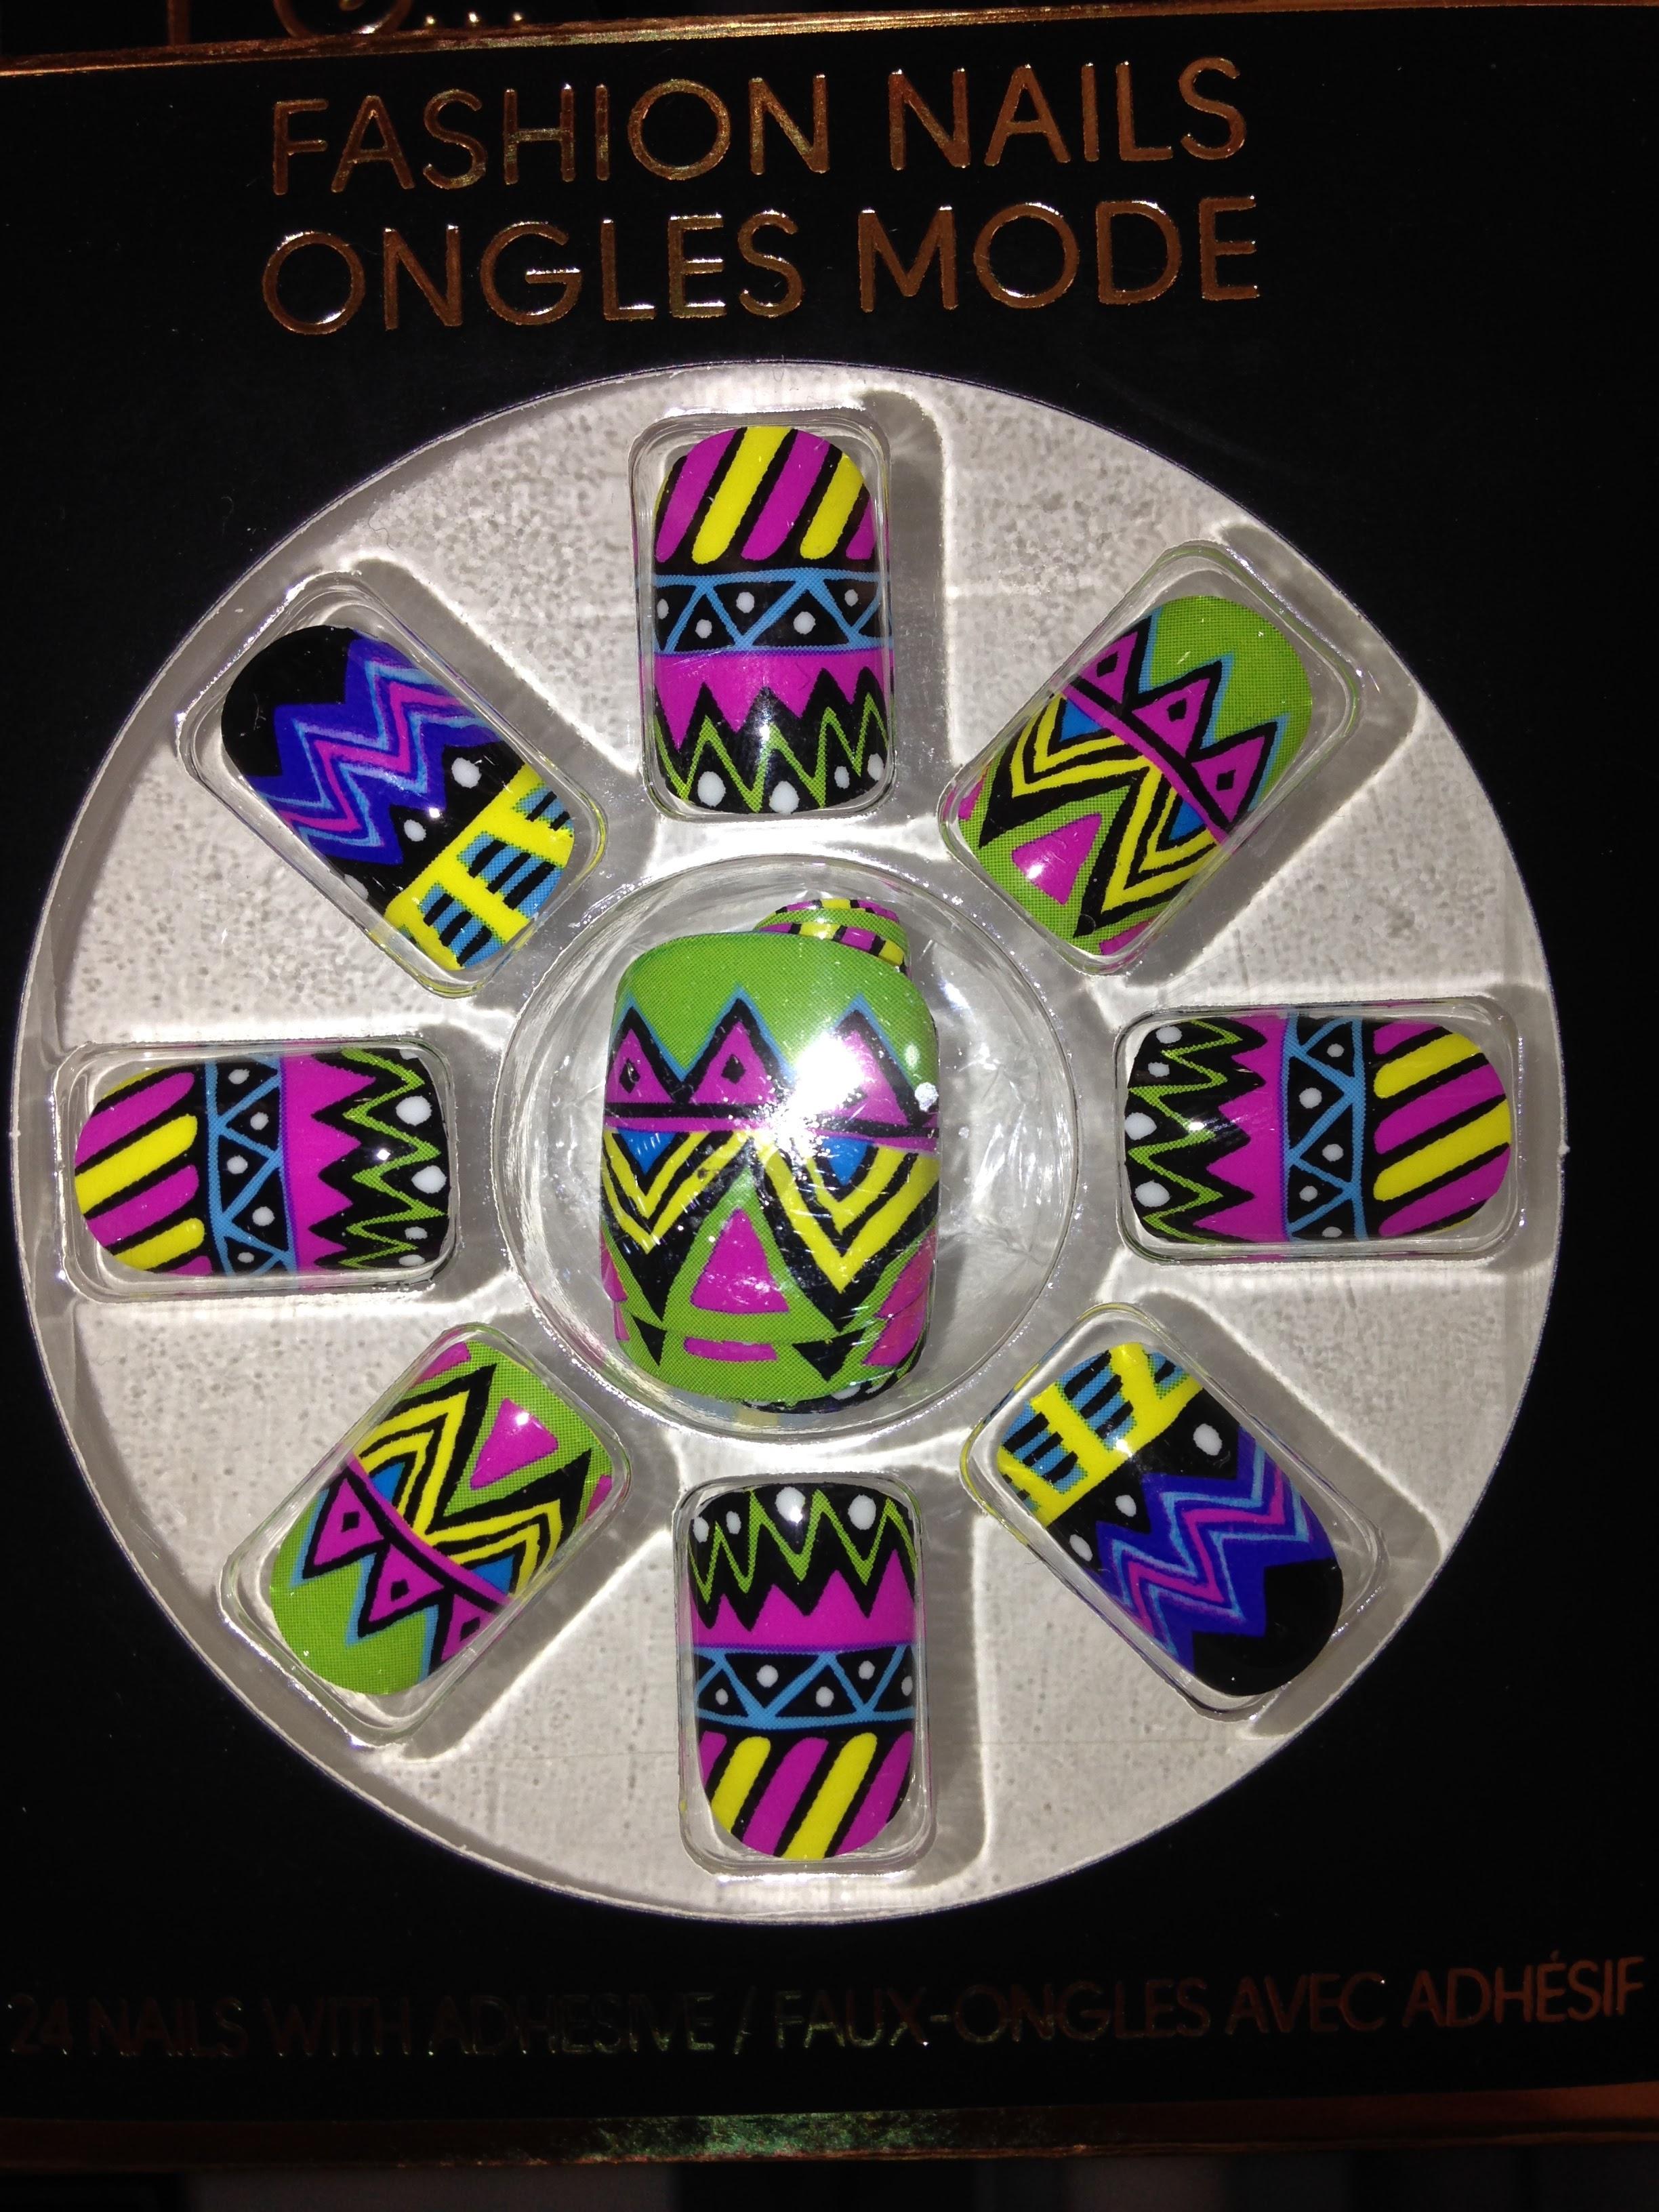 Fab coloured false nails. €1.50 Penneys